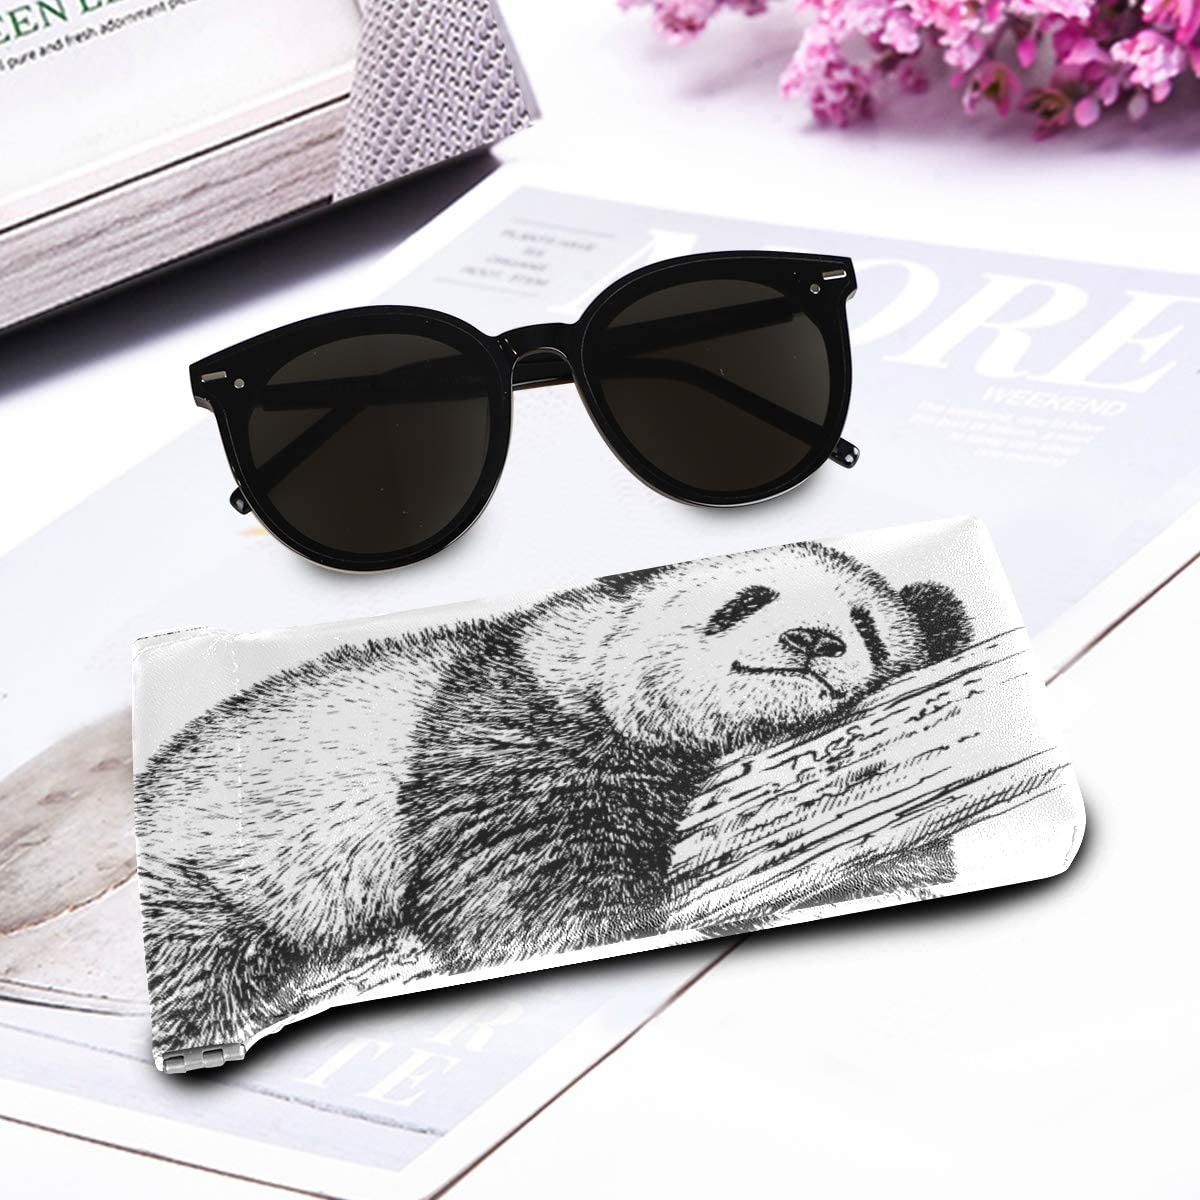 Holder Goggles Bag Eyeglasses Pouch Sunglasses Case present Cute Animal Panda Bear Multiuse Portable